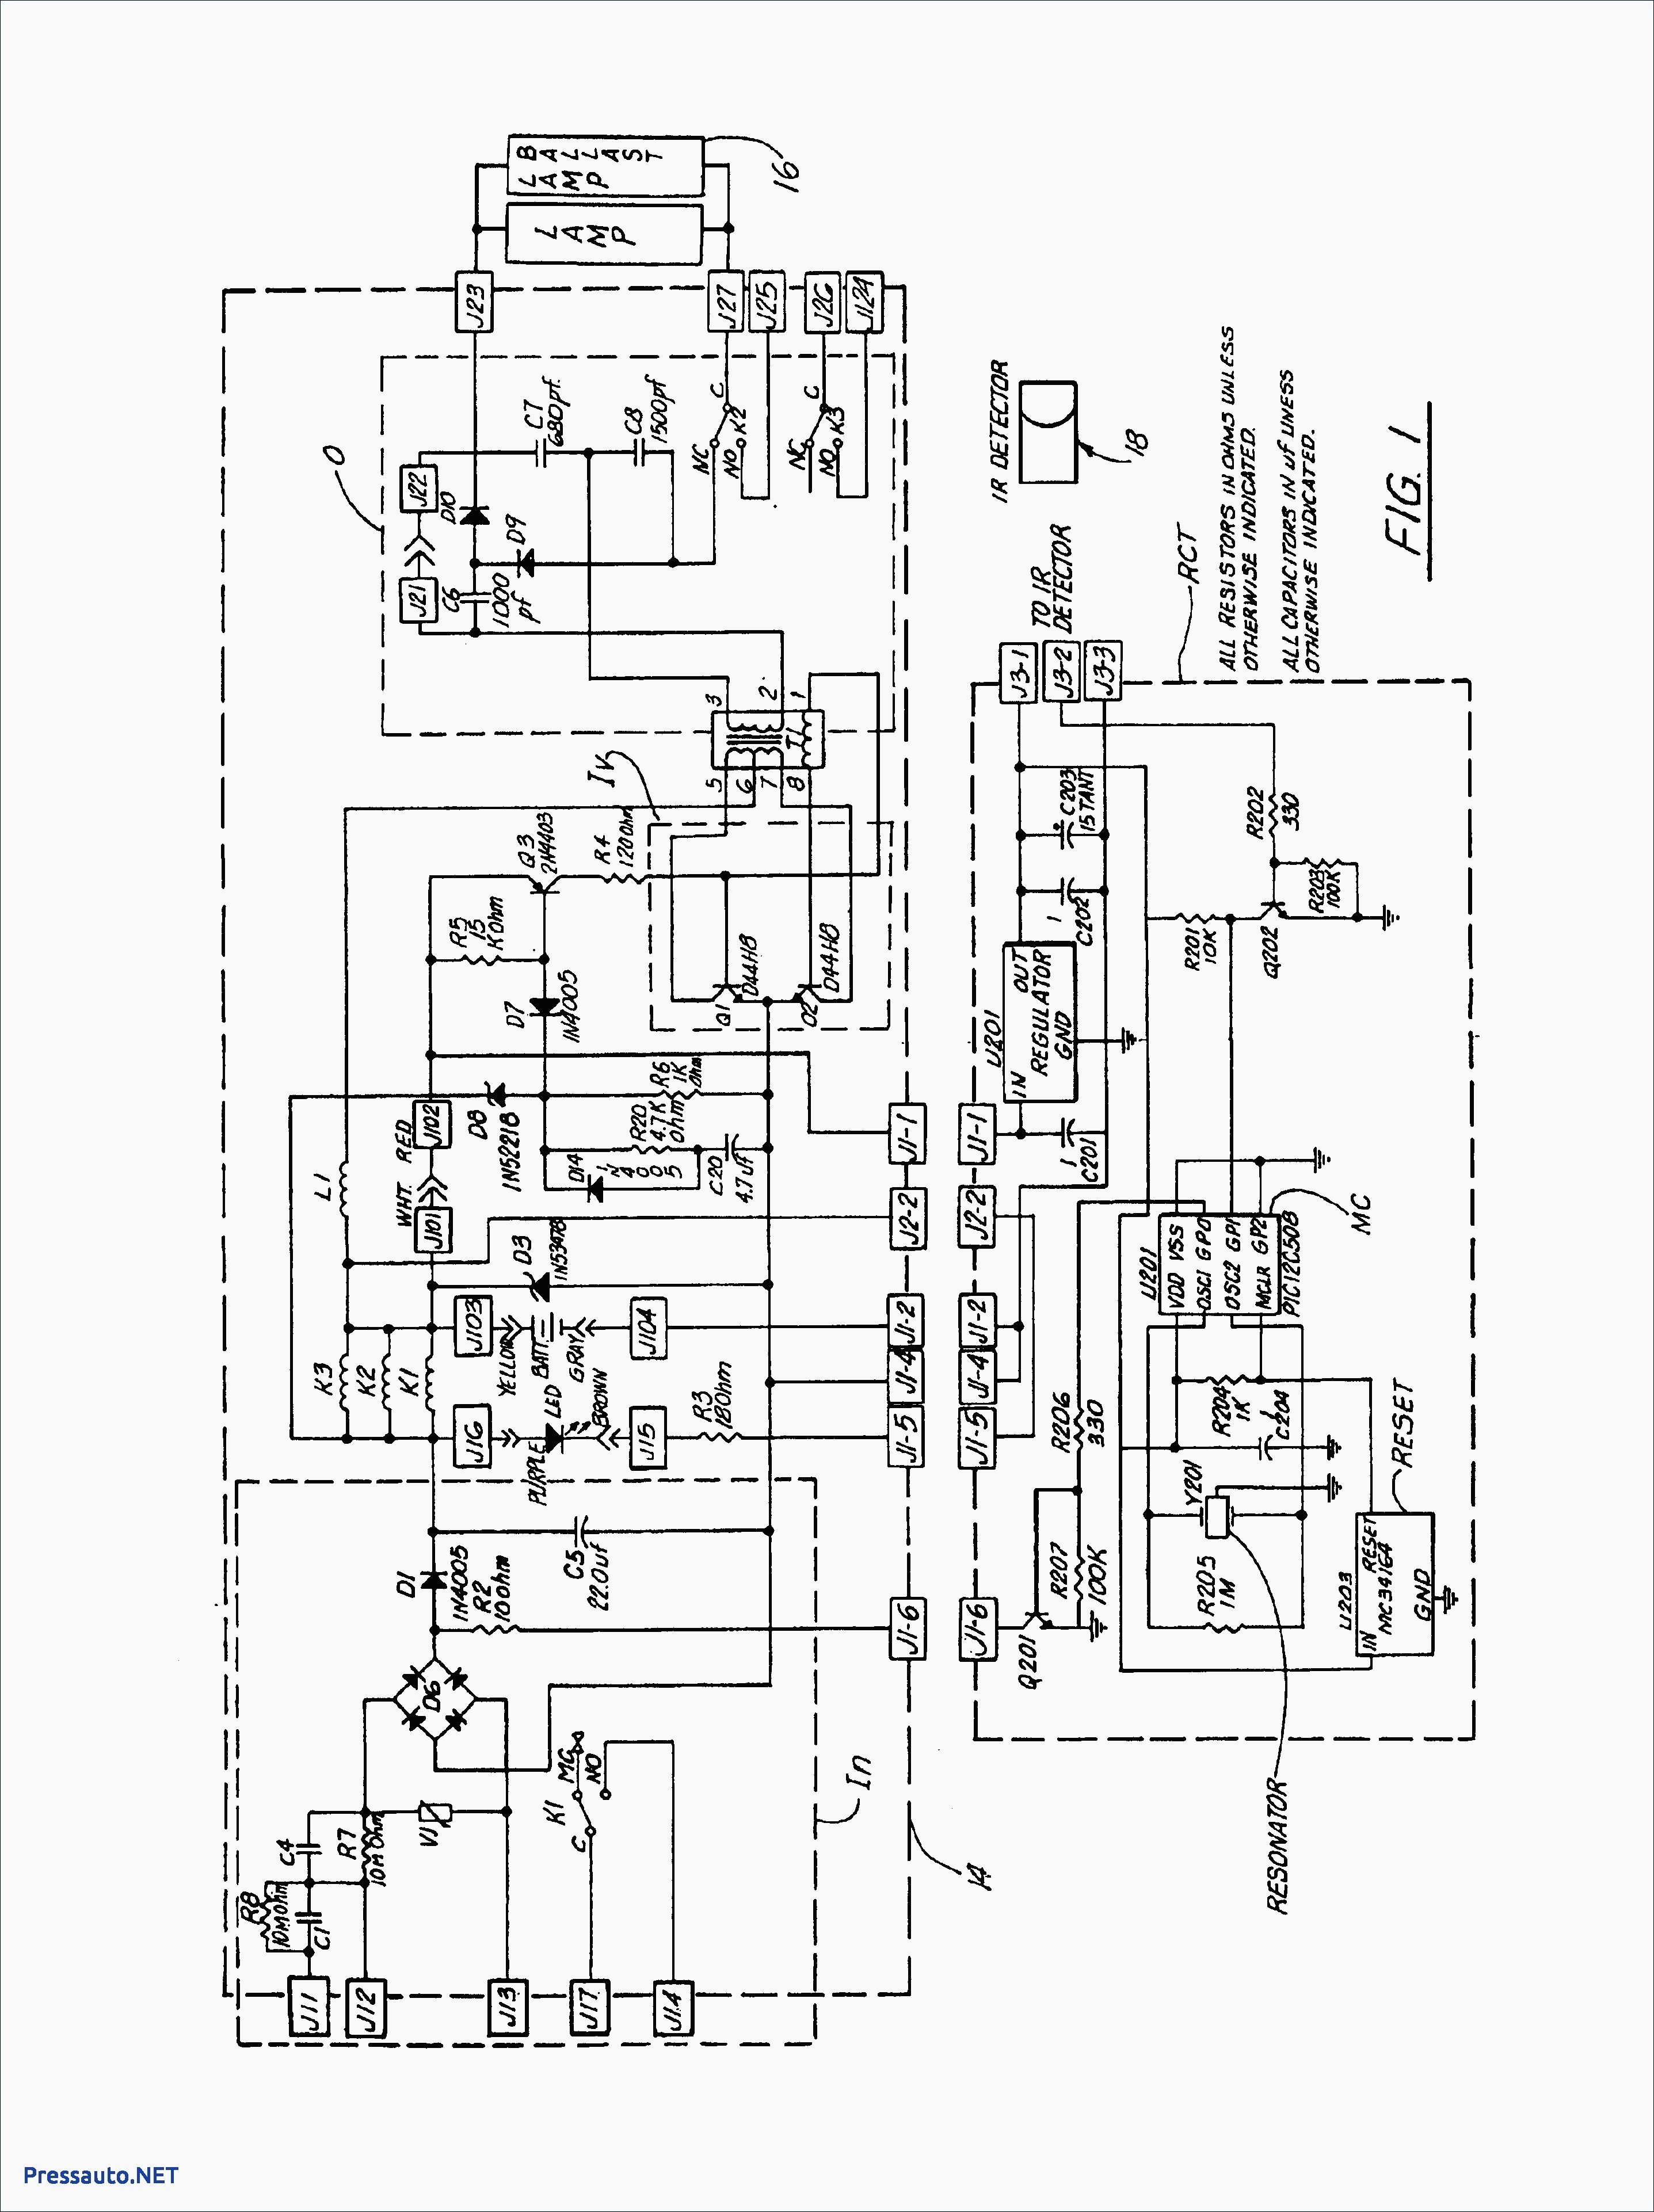 hid ballast wiring diagram for 480 volt wiring library General Electric Ballast Wiring Diagram 400 hps wiring diagram easy to read wiring diagrams u2022 347 volt hid ballast wiring